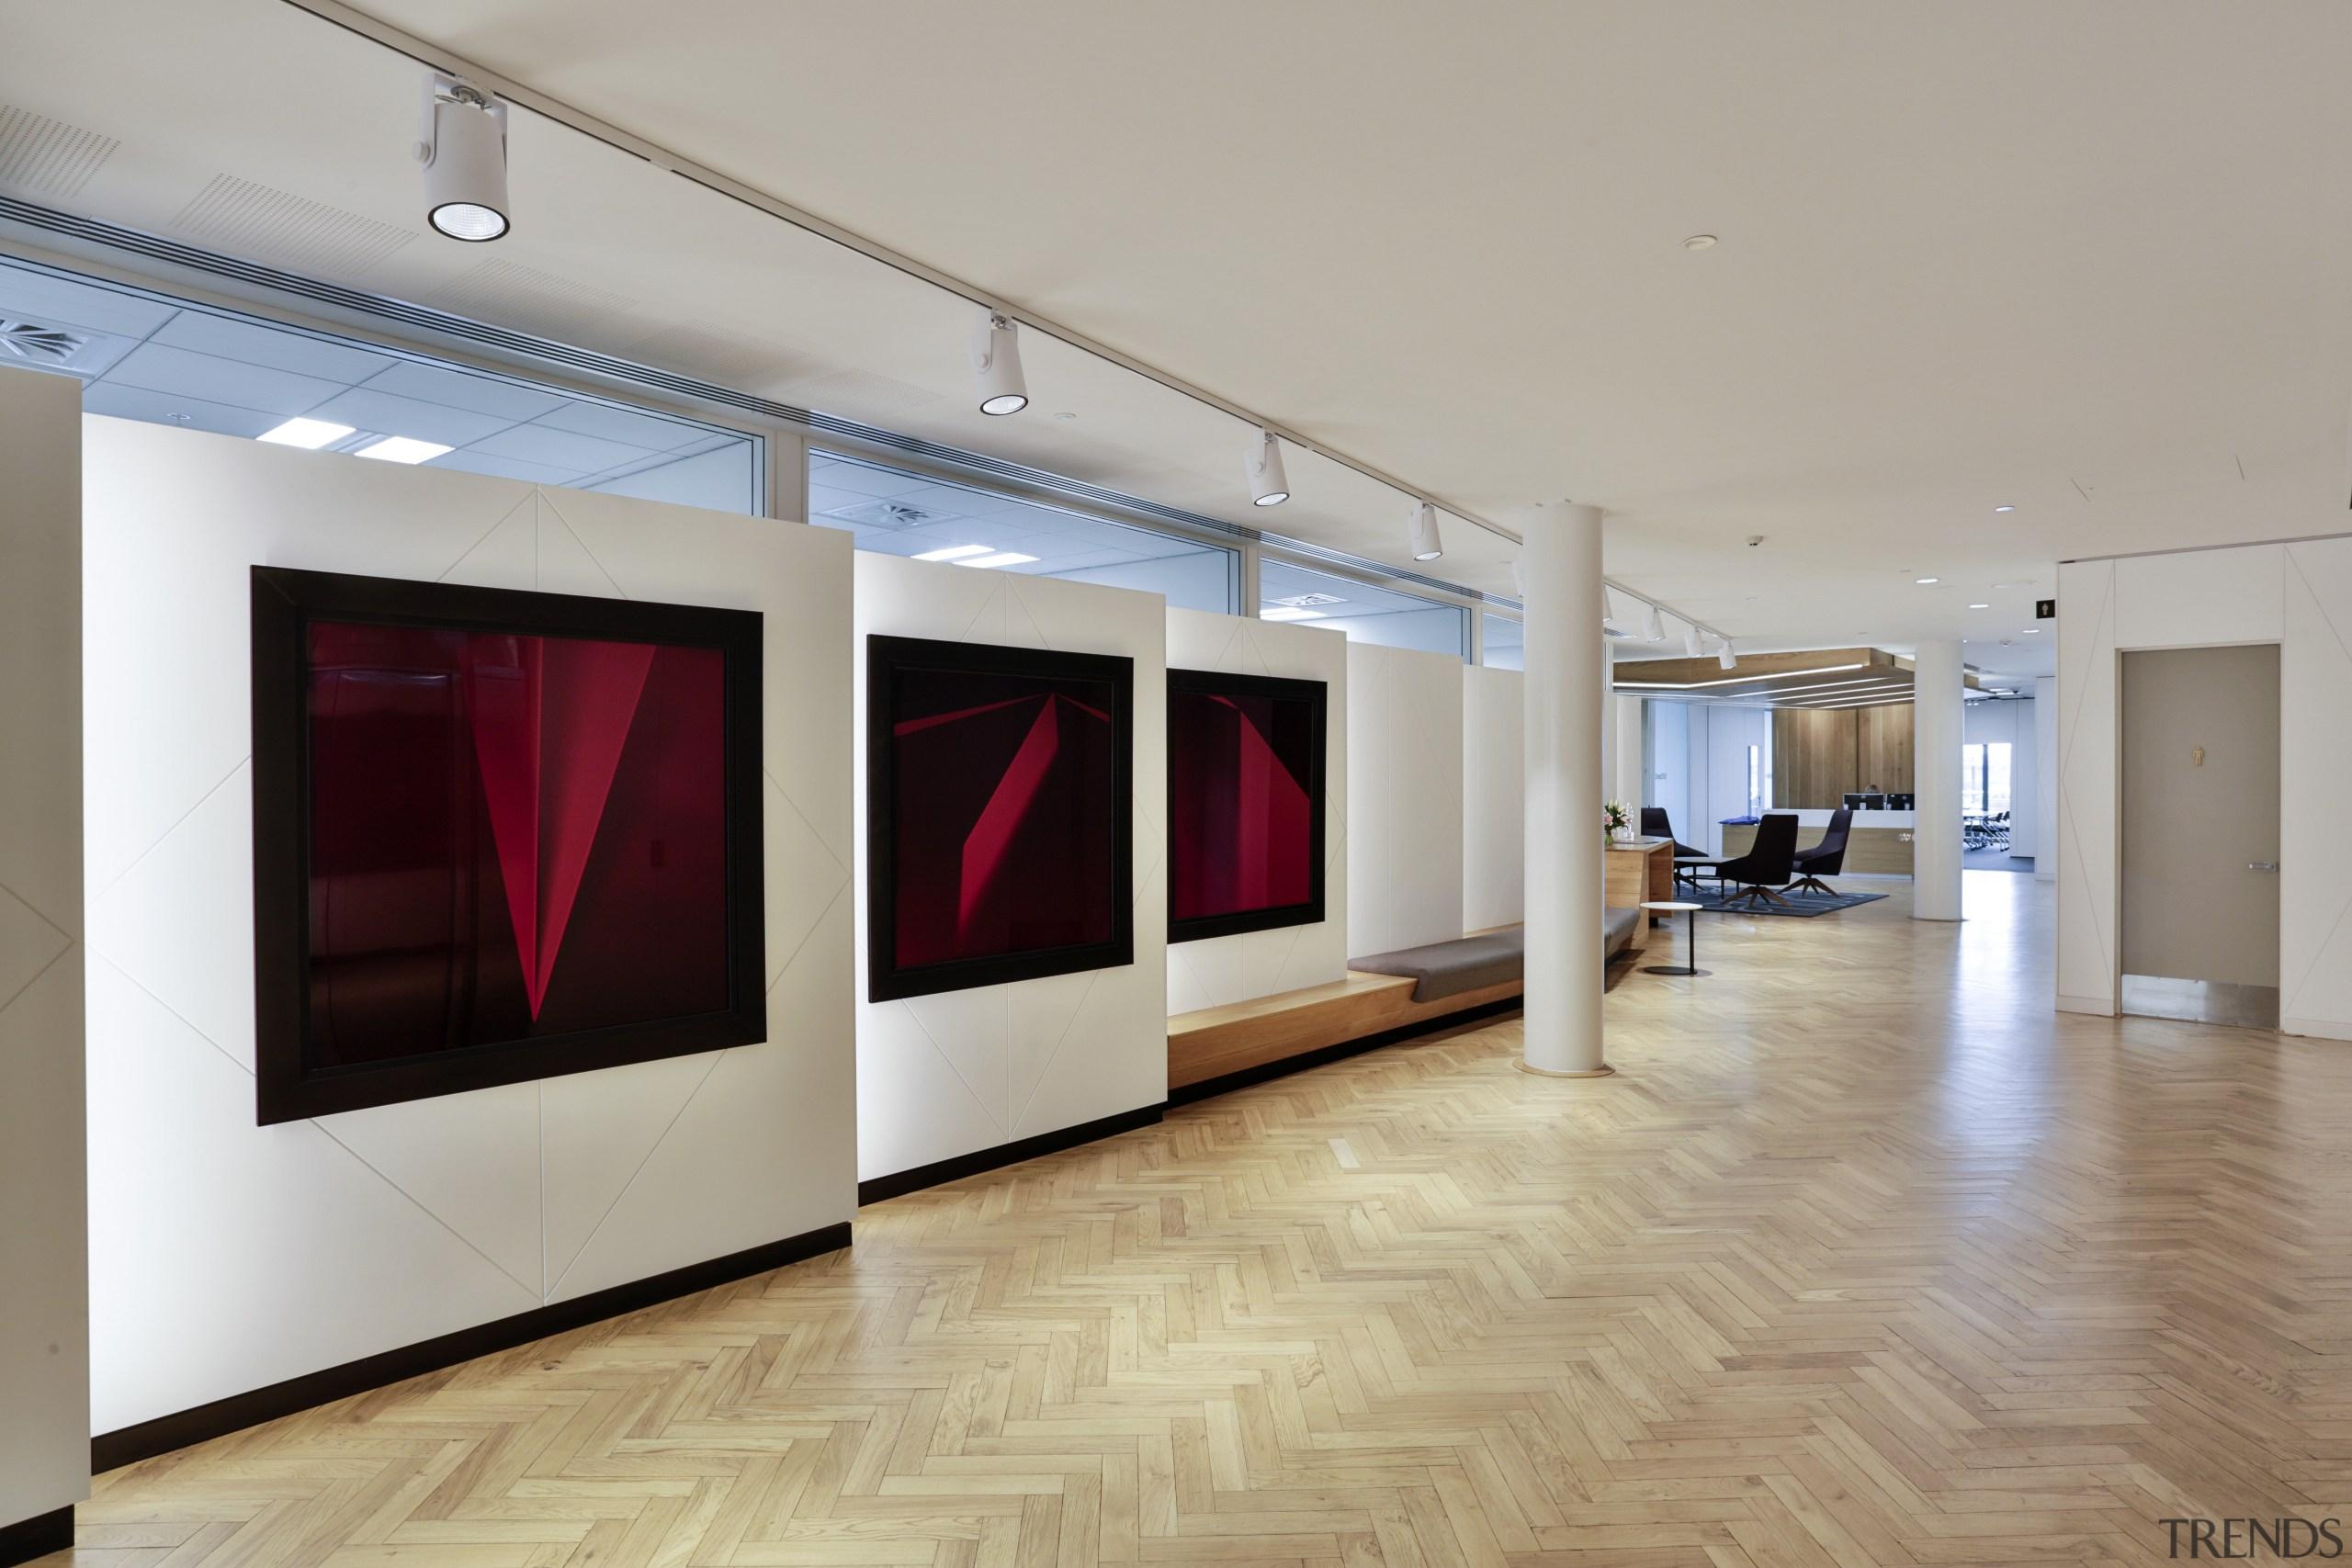 Art for organisations sake  visitors to the ceiling, exhibition, floor, flooring, interior design, lobby, tourist attraction, wood flooring, gray